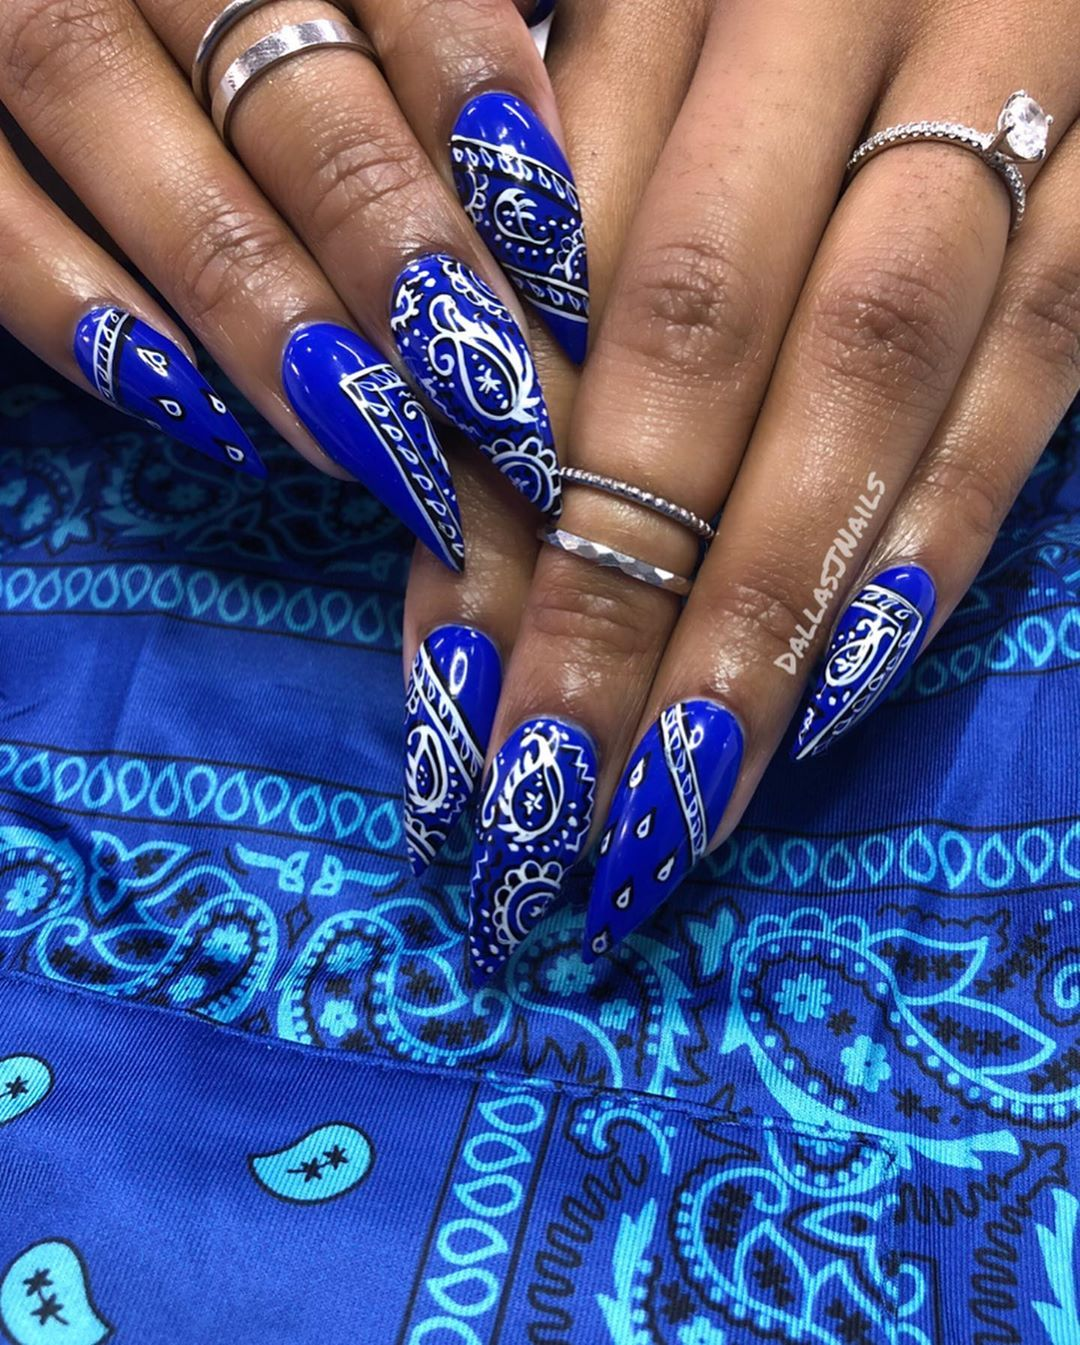 Dallasjnails On Instagram Crip Iana Shop Popspicemiami For All The Flyest Fits In Miami Swipe Bandana Nails Coffin Nails Designs Ghetto Nails